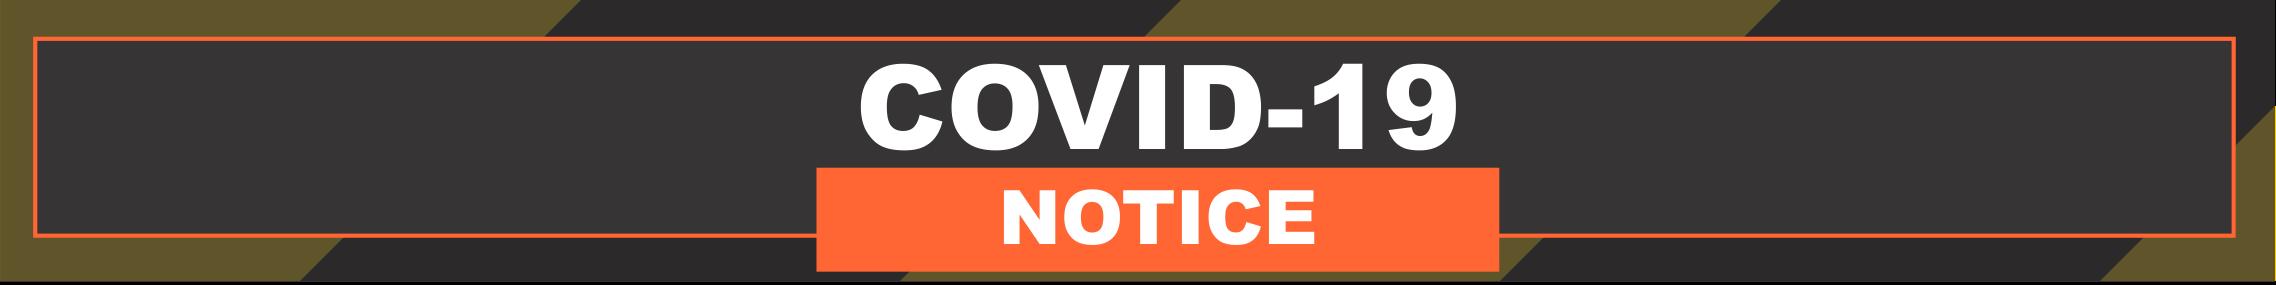 COVID-19 Notice Banner